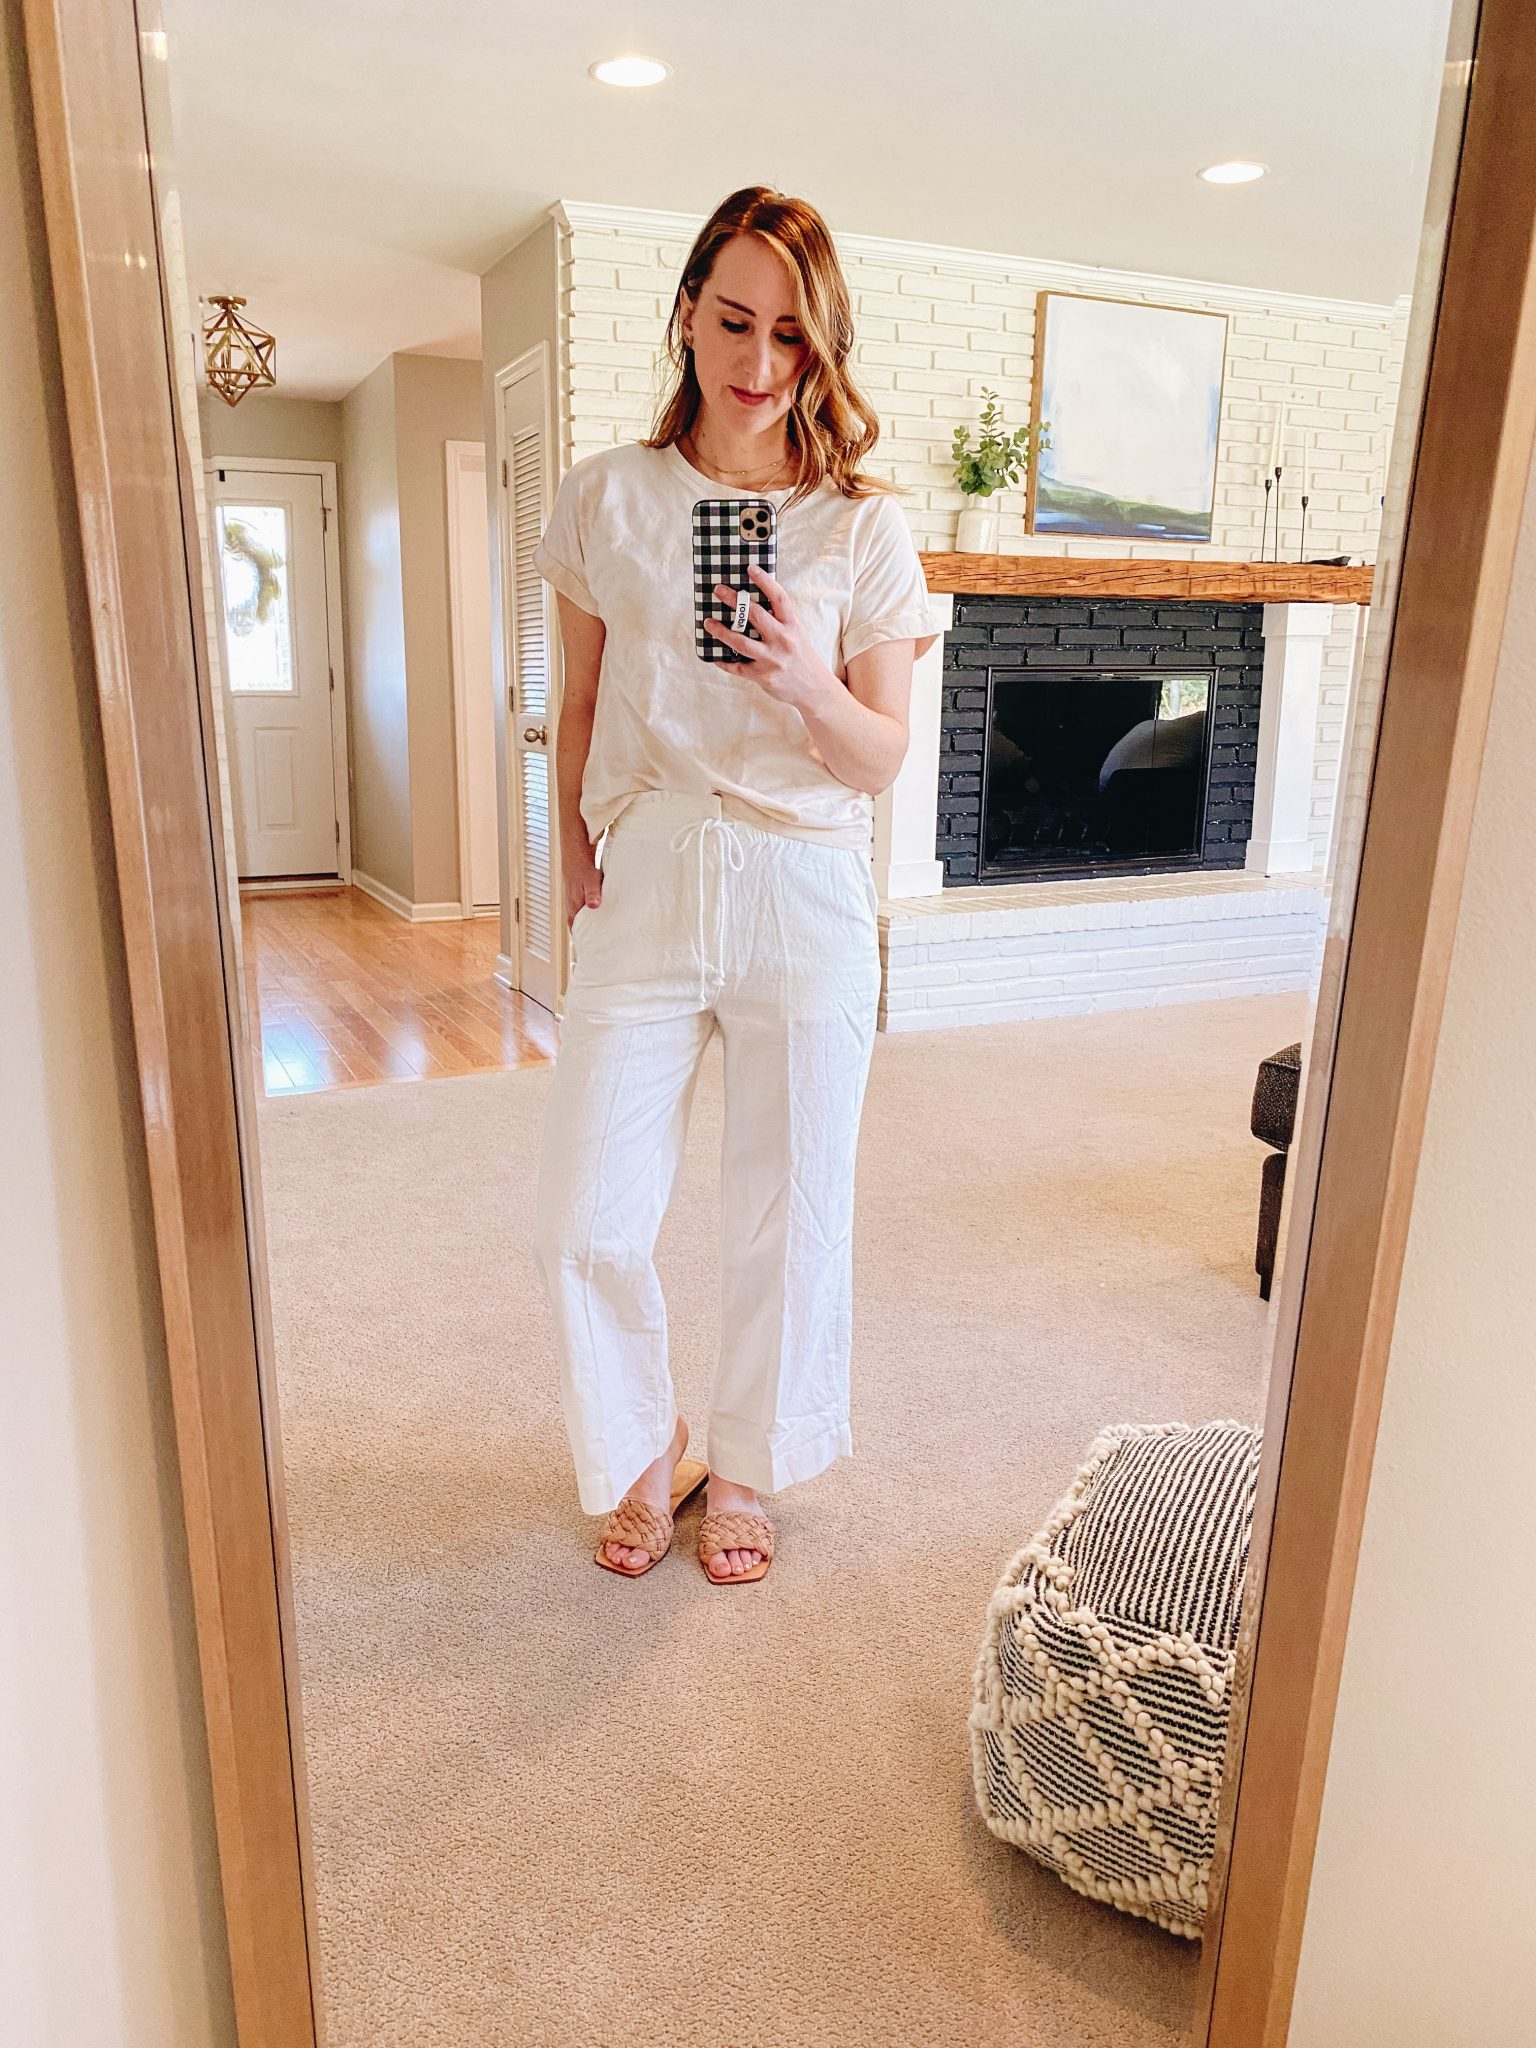 April favorites | Daily Splendor Life and Style Blog | Braided slides #springoutfit #linenpants #marcfisher